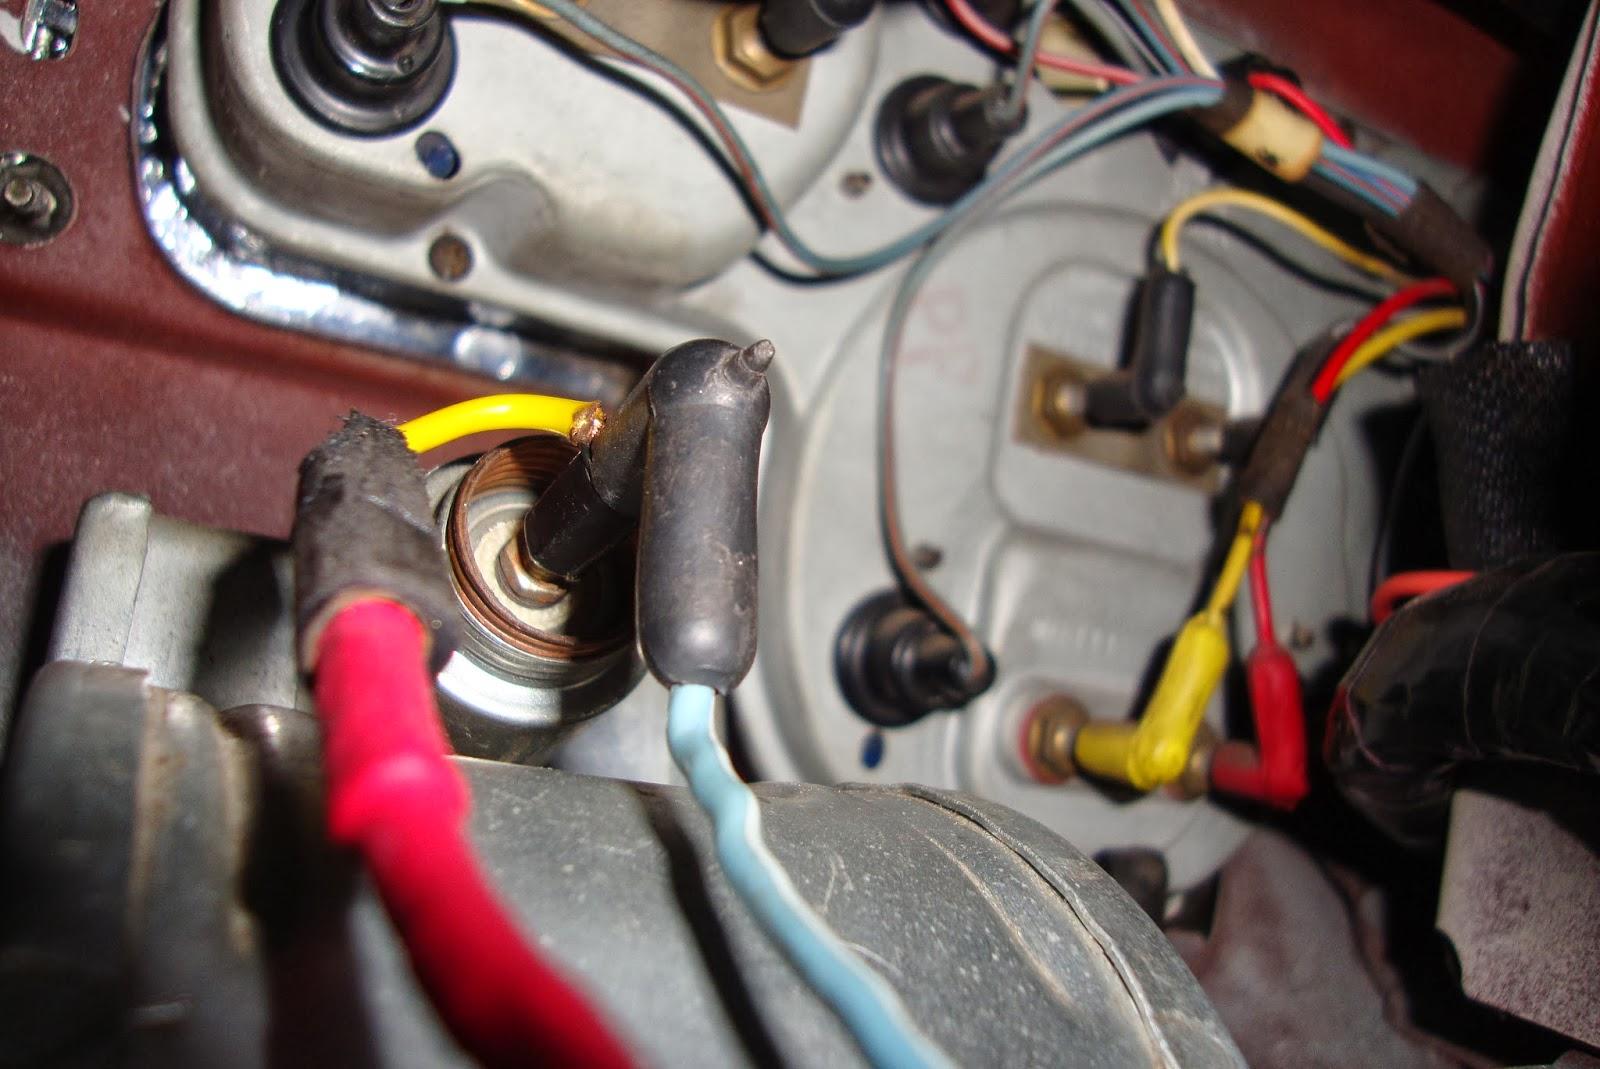 1968 mustang convertible restoration a retro sounding retro mod rh 68vert blogspot com Cigarette Lighter Wiring Harness Cigarette Lighter Socket Wiring